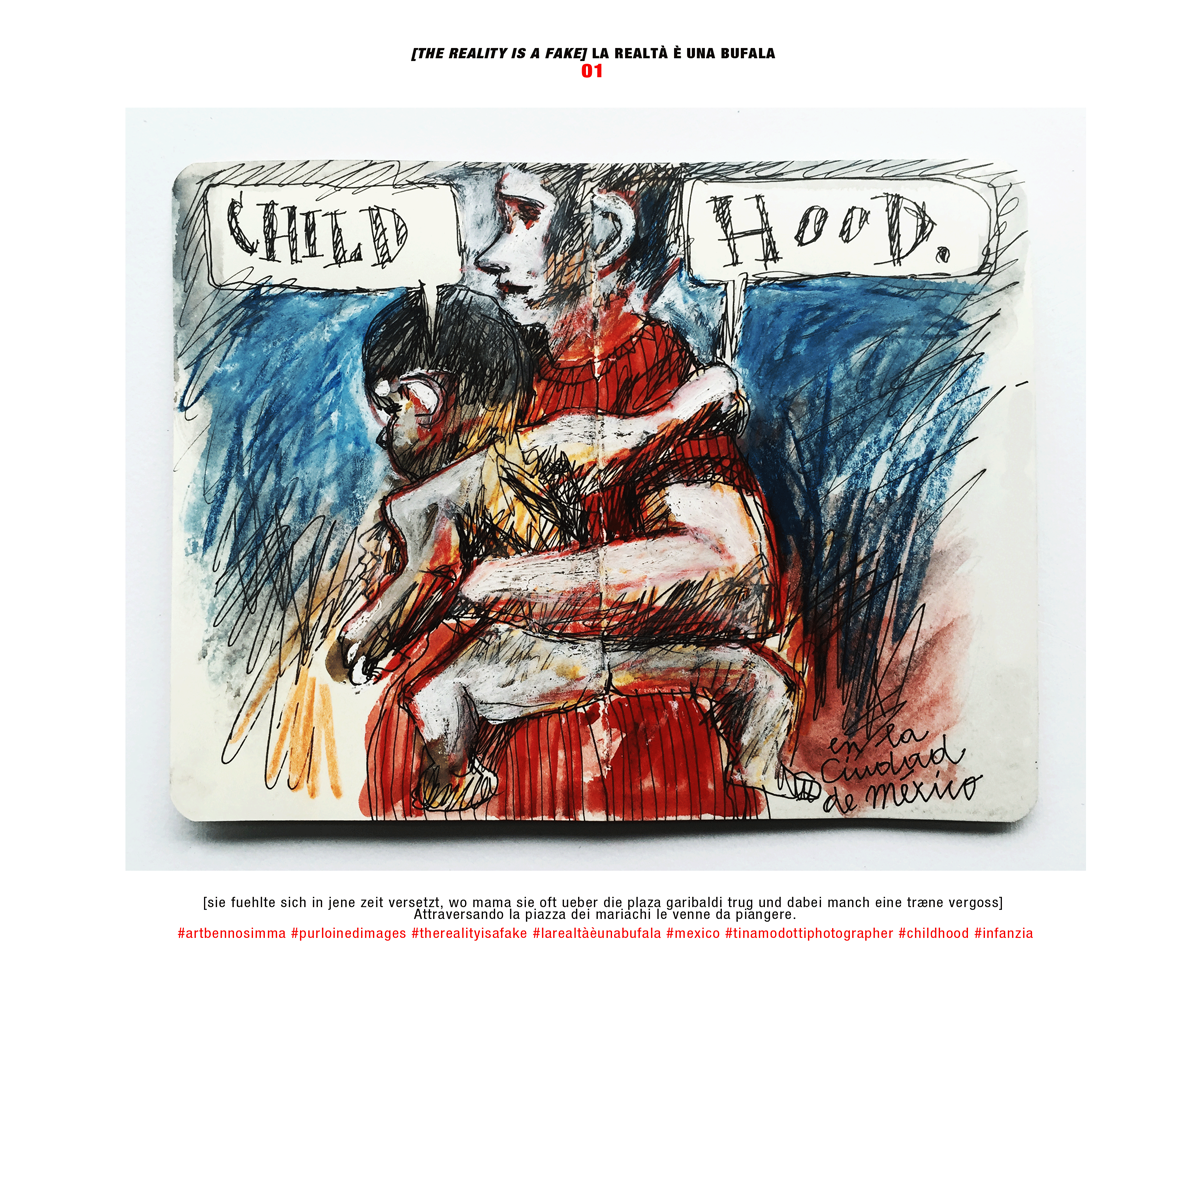 160616-CHILD-HOOD-1200